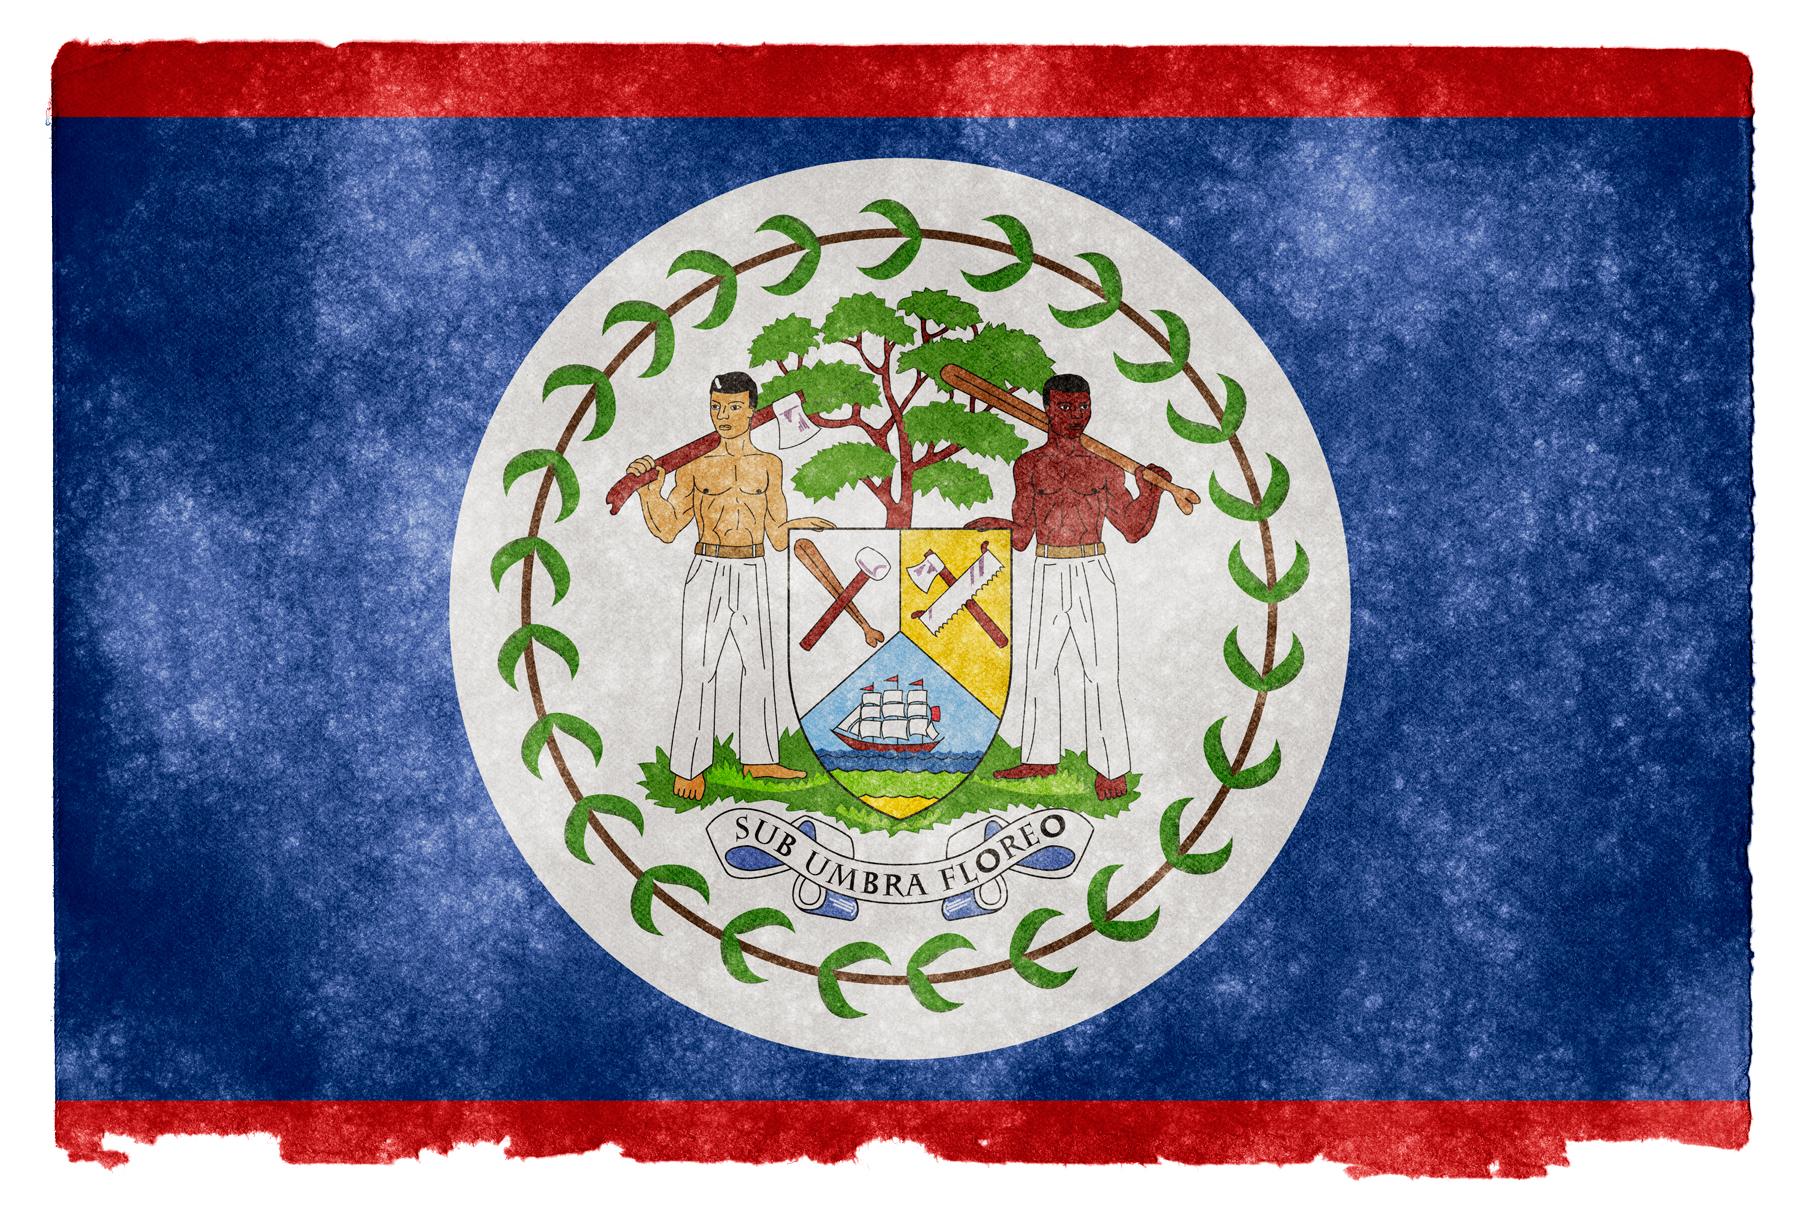 Belize grunge flag photo